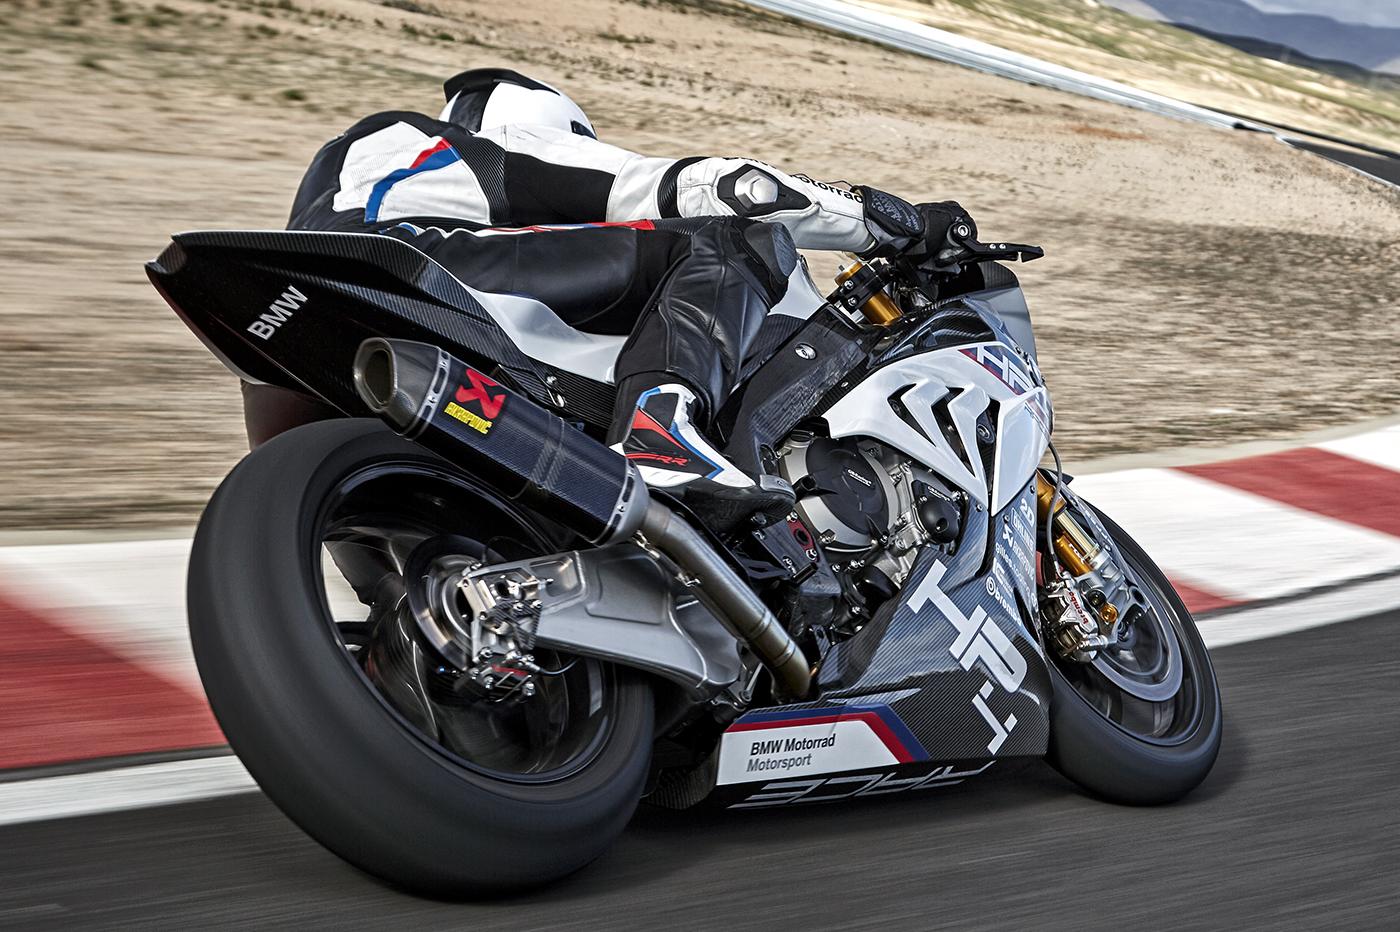 2017-bmw-motorrad-hp4-race-27.jpg